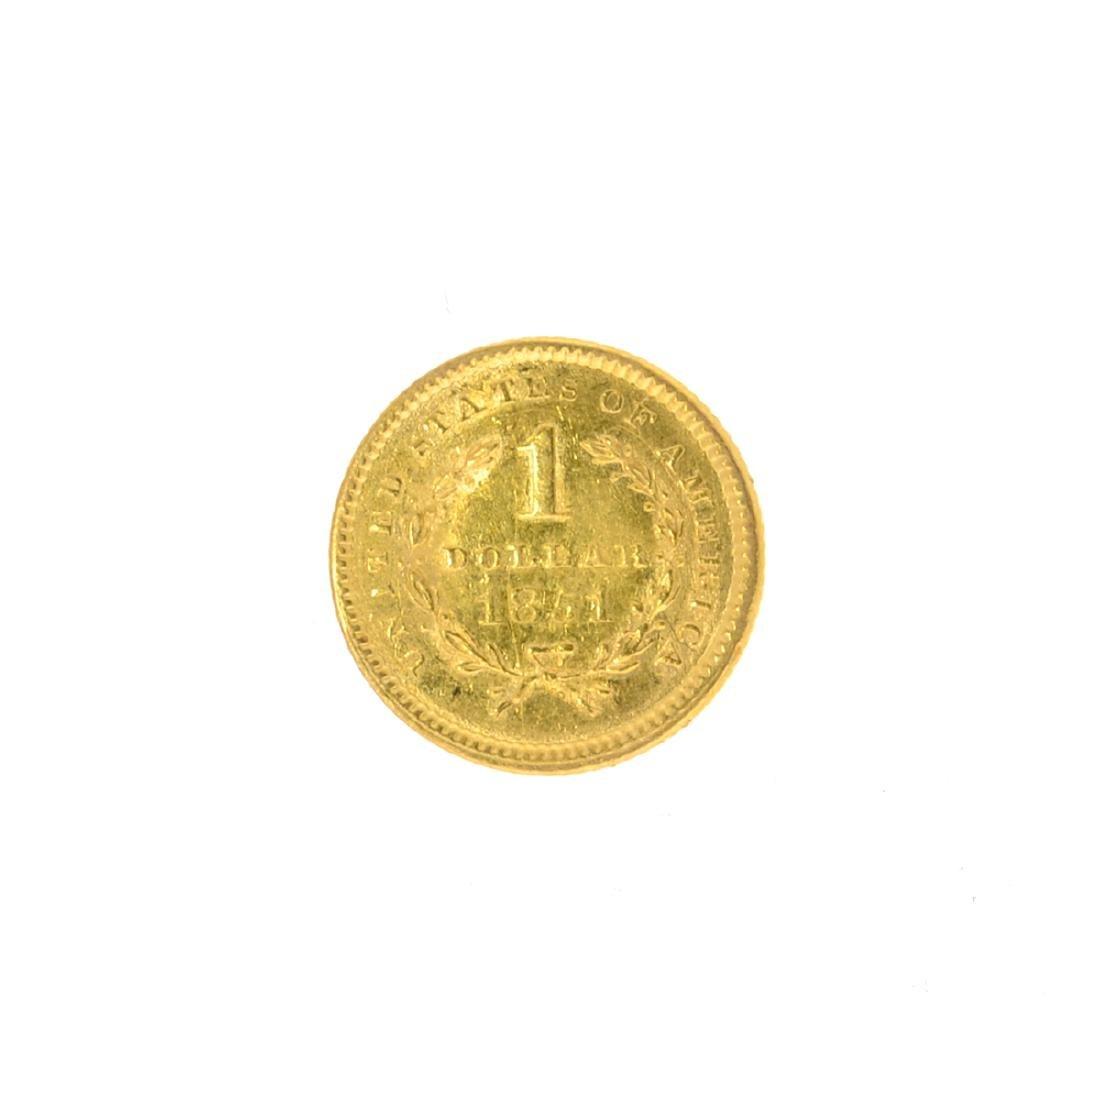 *1851 $1 U.S. Liberty Head Gold Coin (JG N) - 2